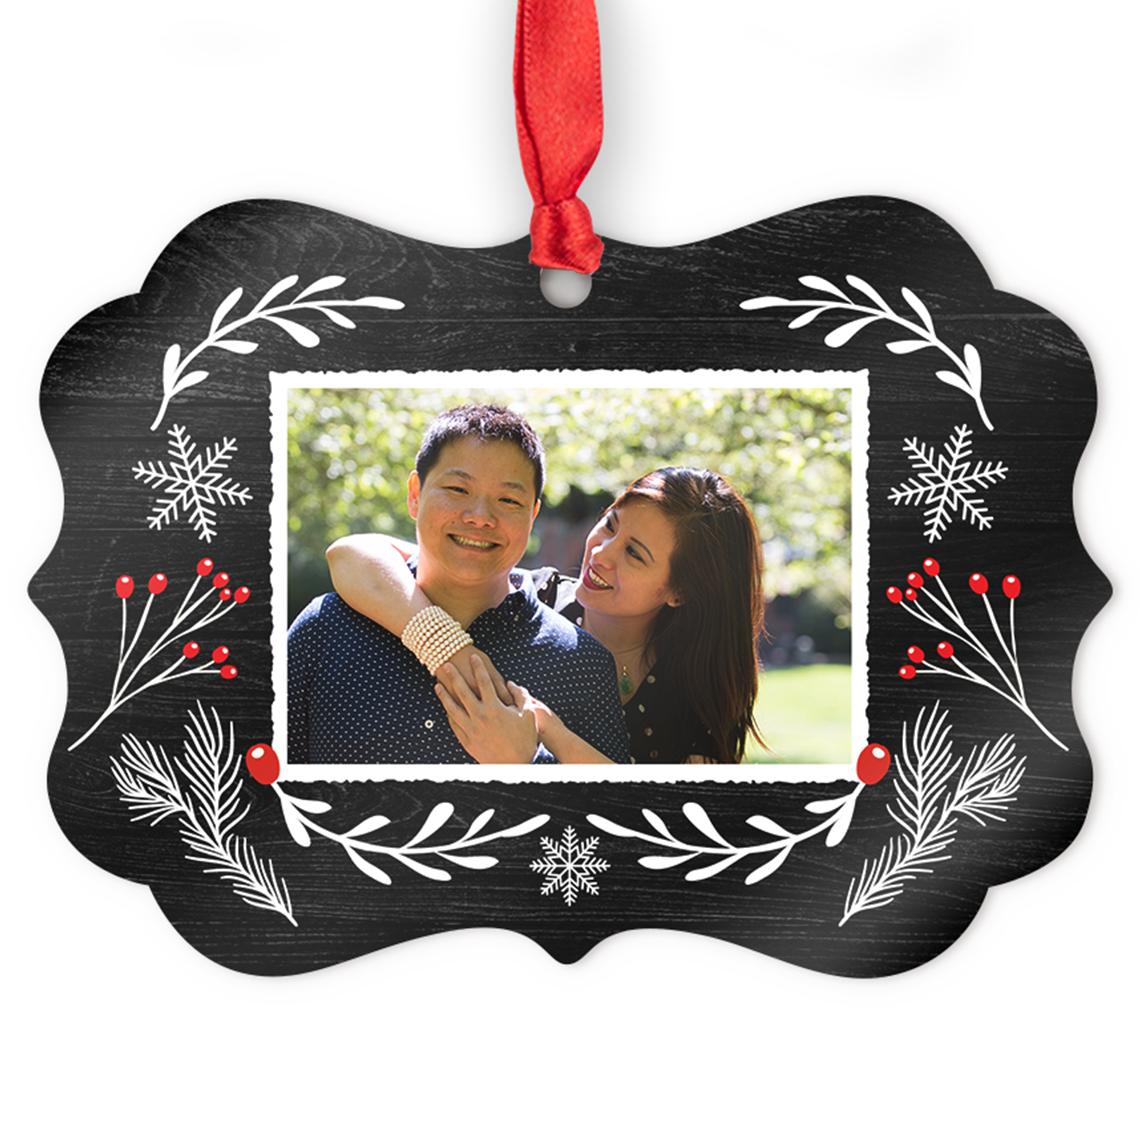 Aluminum Medallion Photo Ornament | Christmas Ornaments and Decor ...